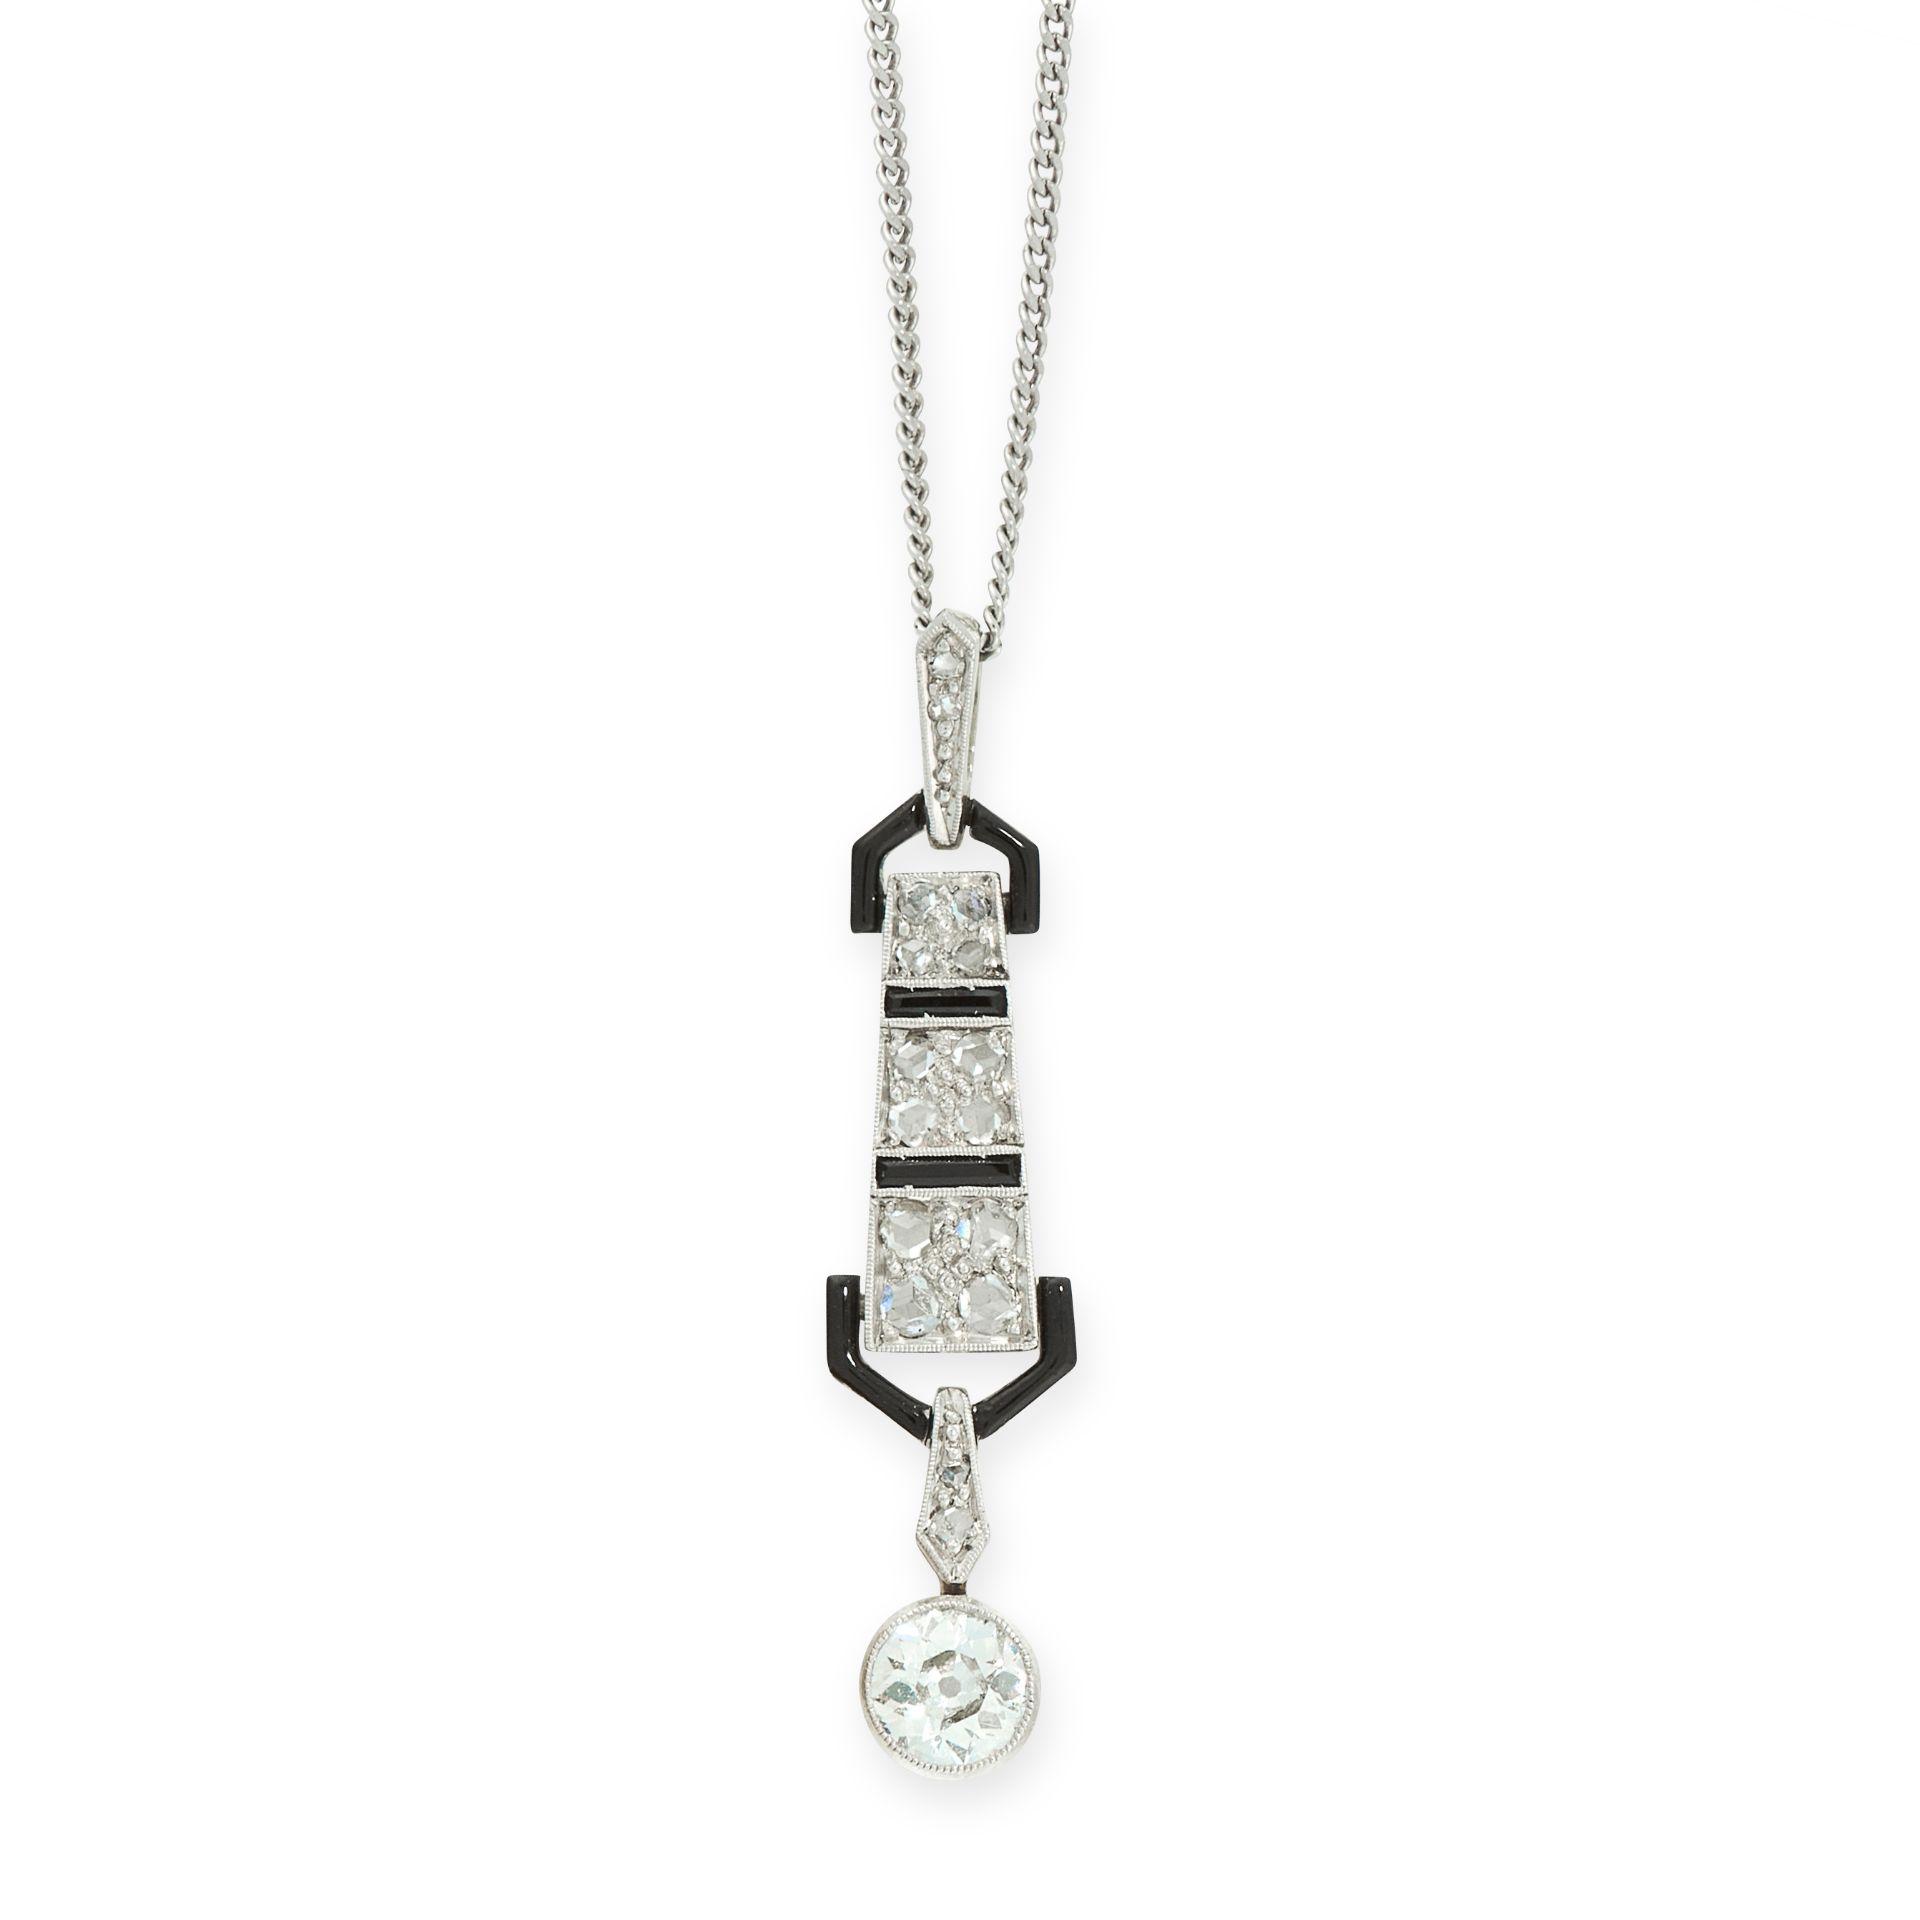 AN ART DECO DIAMOND, ONYX AND ENAMEL PENDANT, EARLY 20TH CENTURY set with an old cut diamond